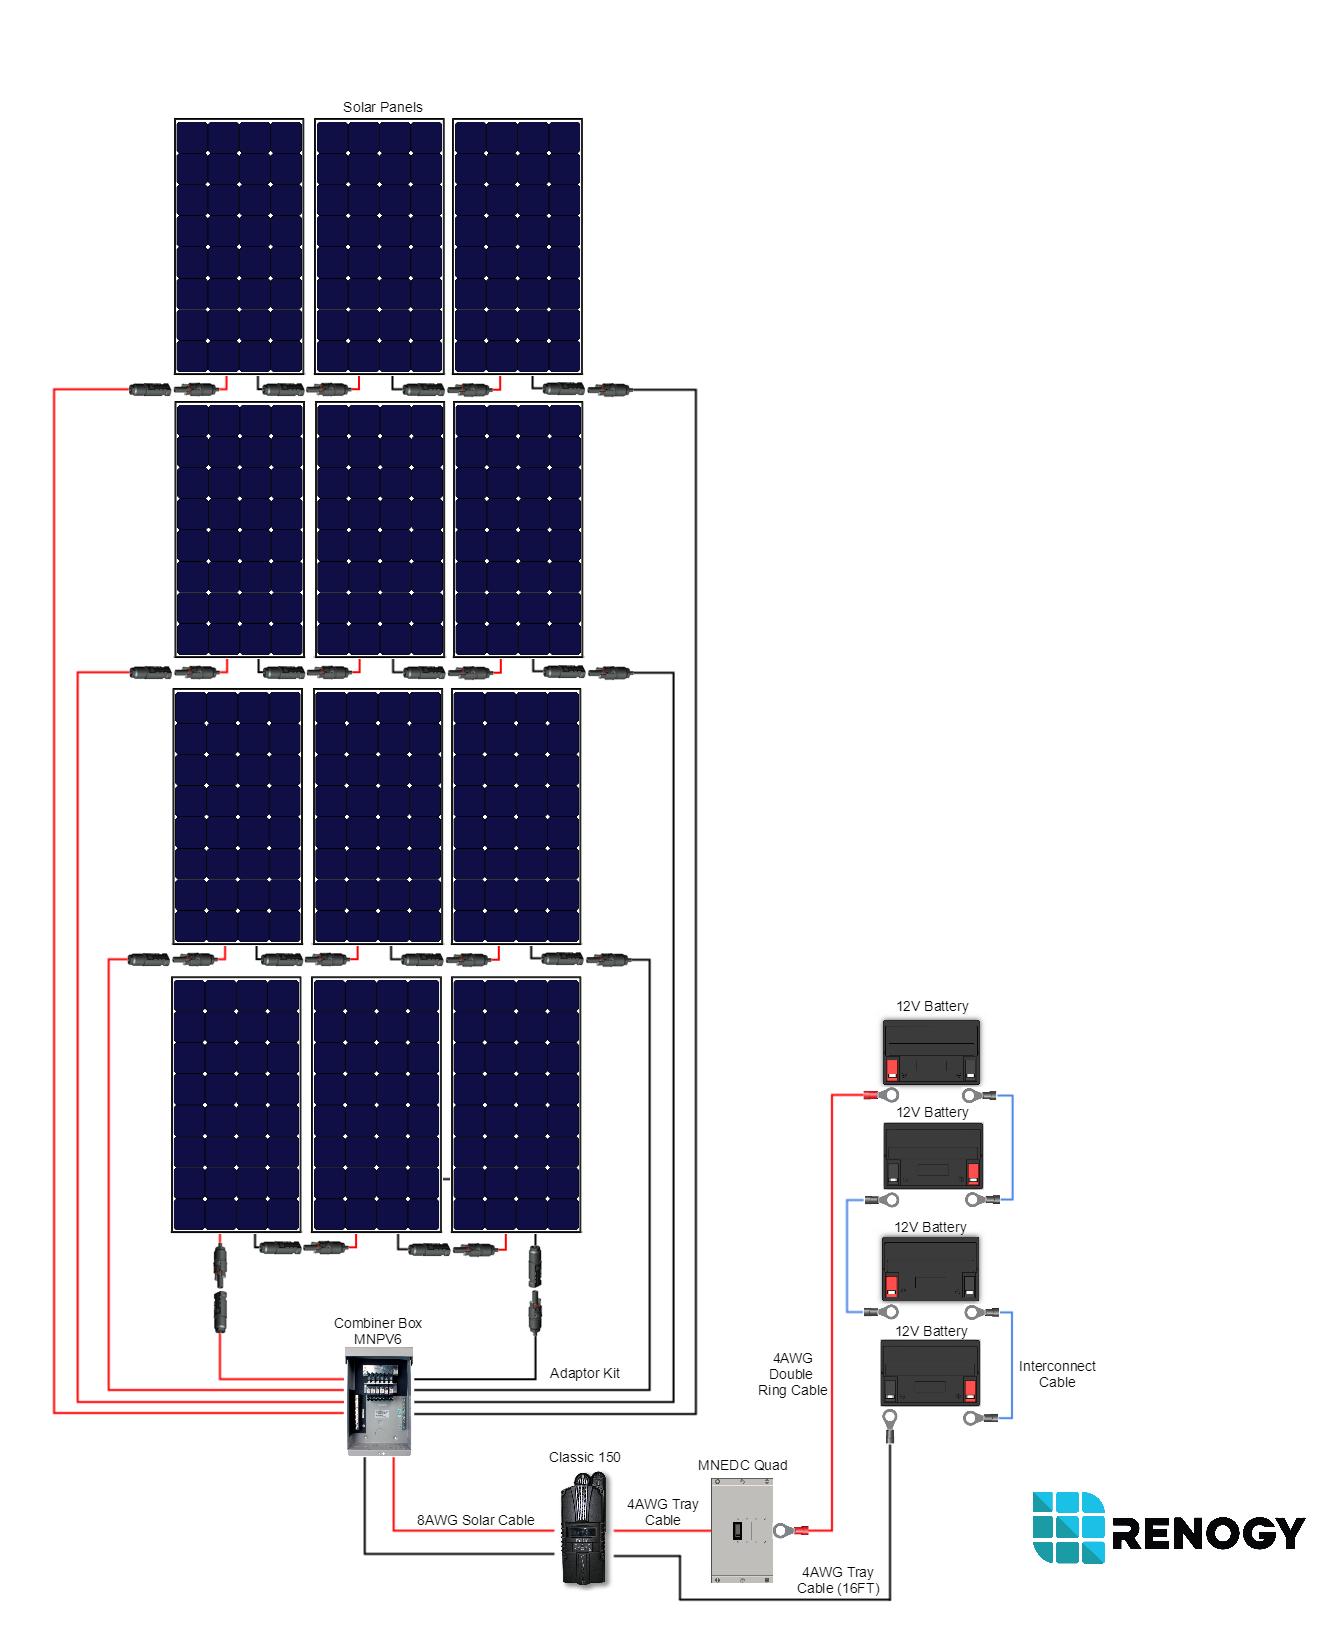 Renogy 3600 watt 48 volt monocrystalline cabin kit renogy solar 123g cheapraybanclubmaster Image collections